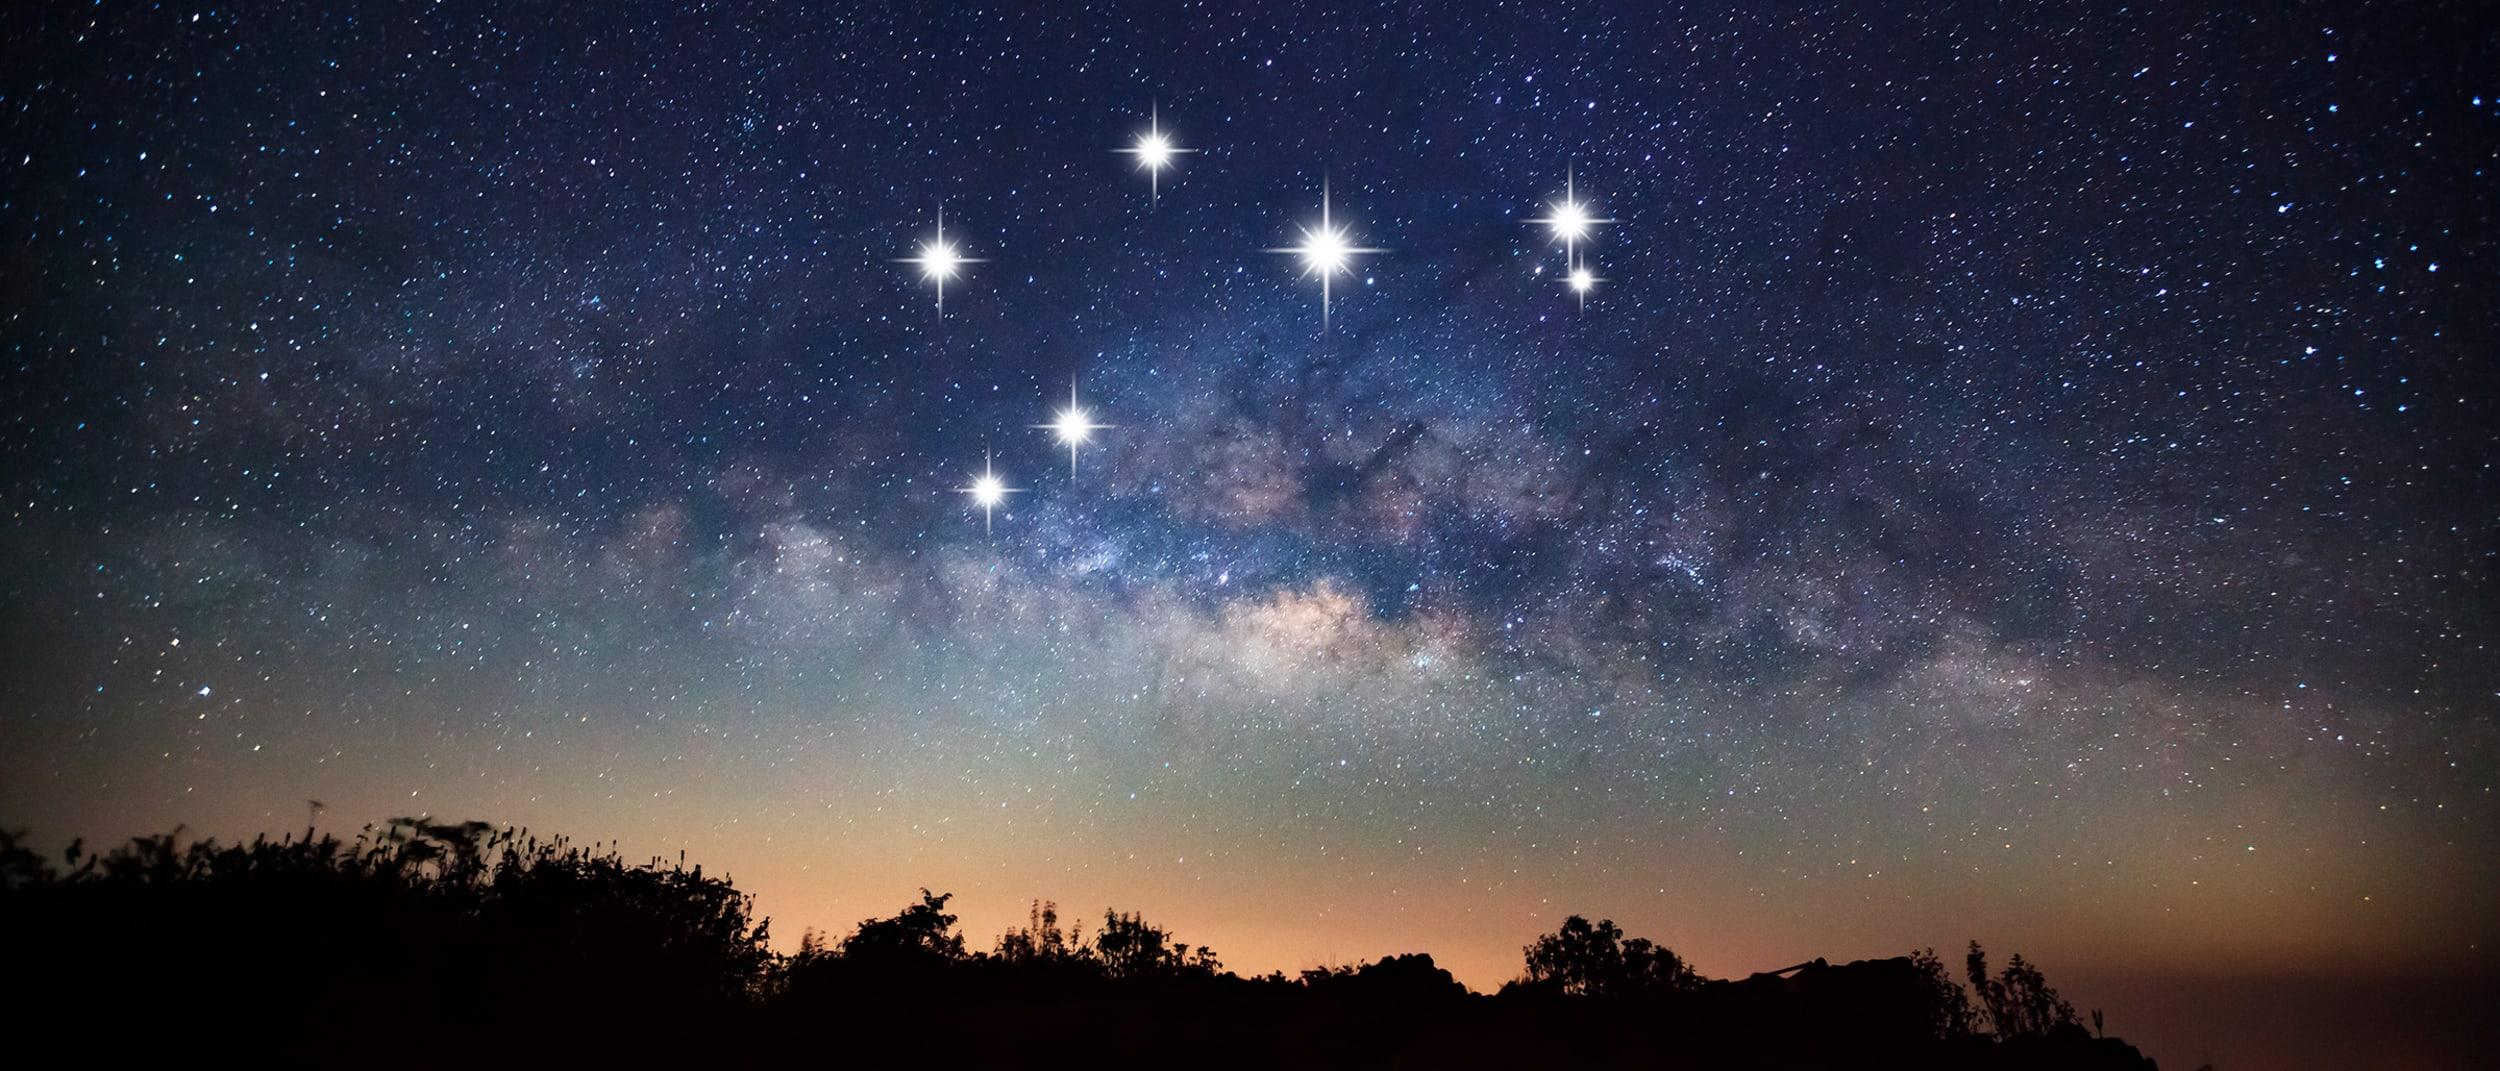 Celebrate the Maori New Year with our Matariki Star Hunt